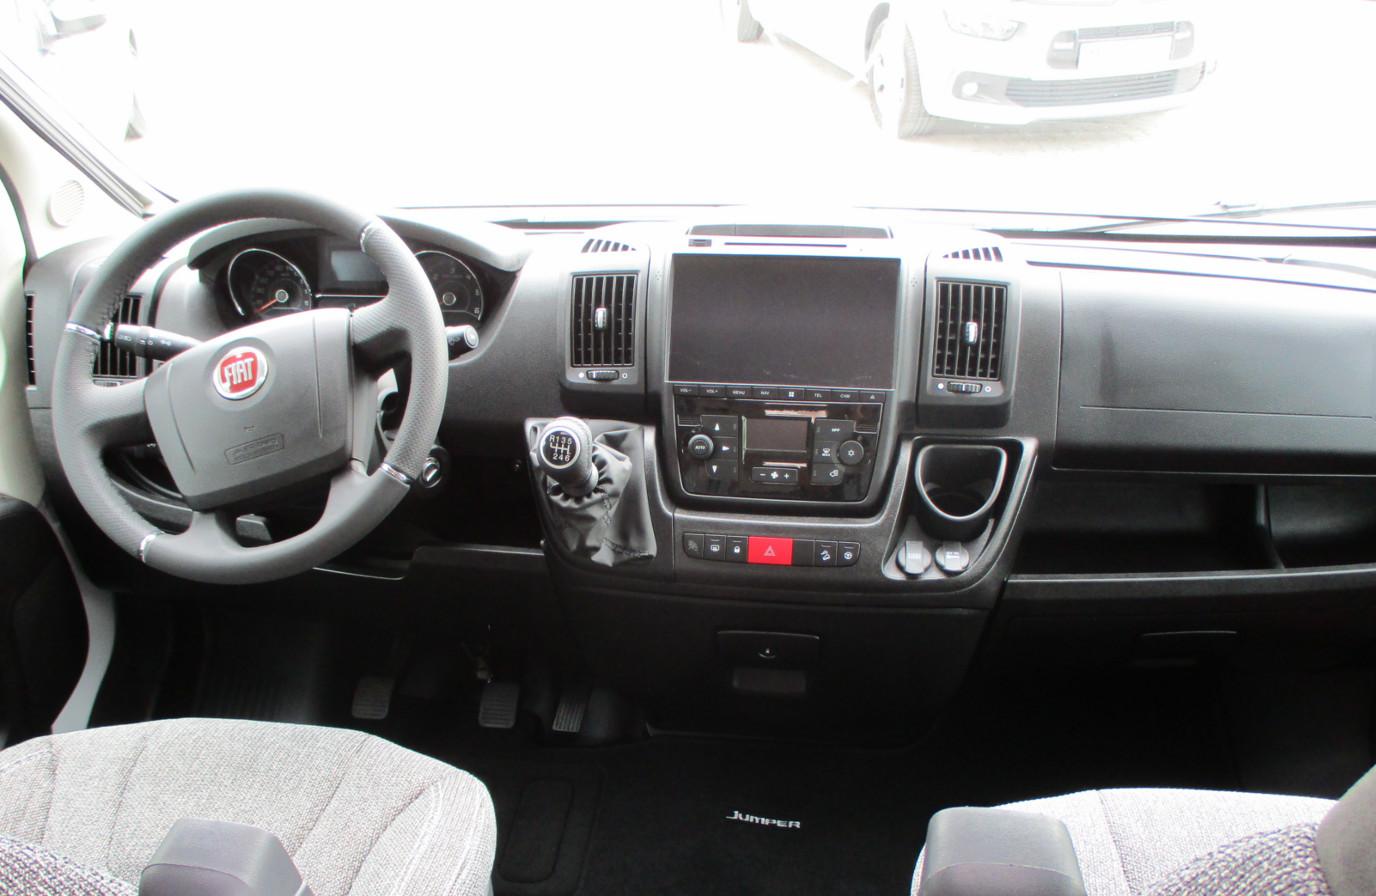 Mietwohnmobil Dethleffs Trend - Fahrerhaus